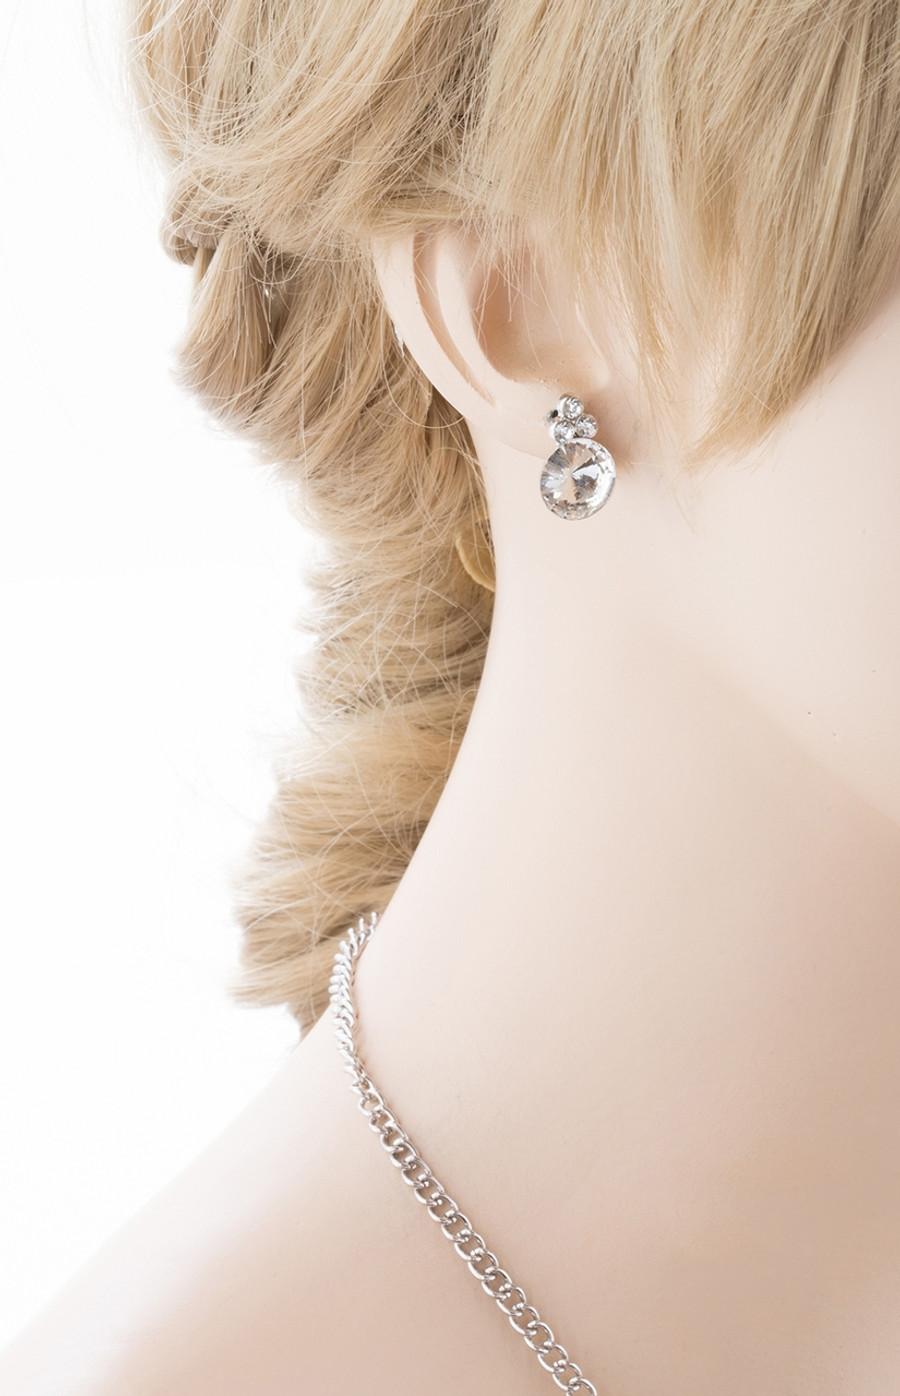 Bridal Wedding Jewelry Crystal Rhinestone Prom Necklace Earrings Set J724 Silver